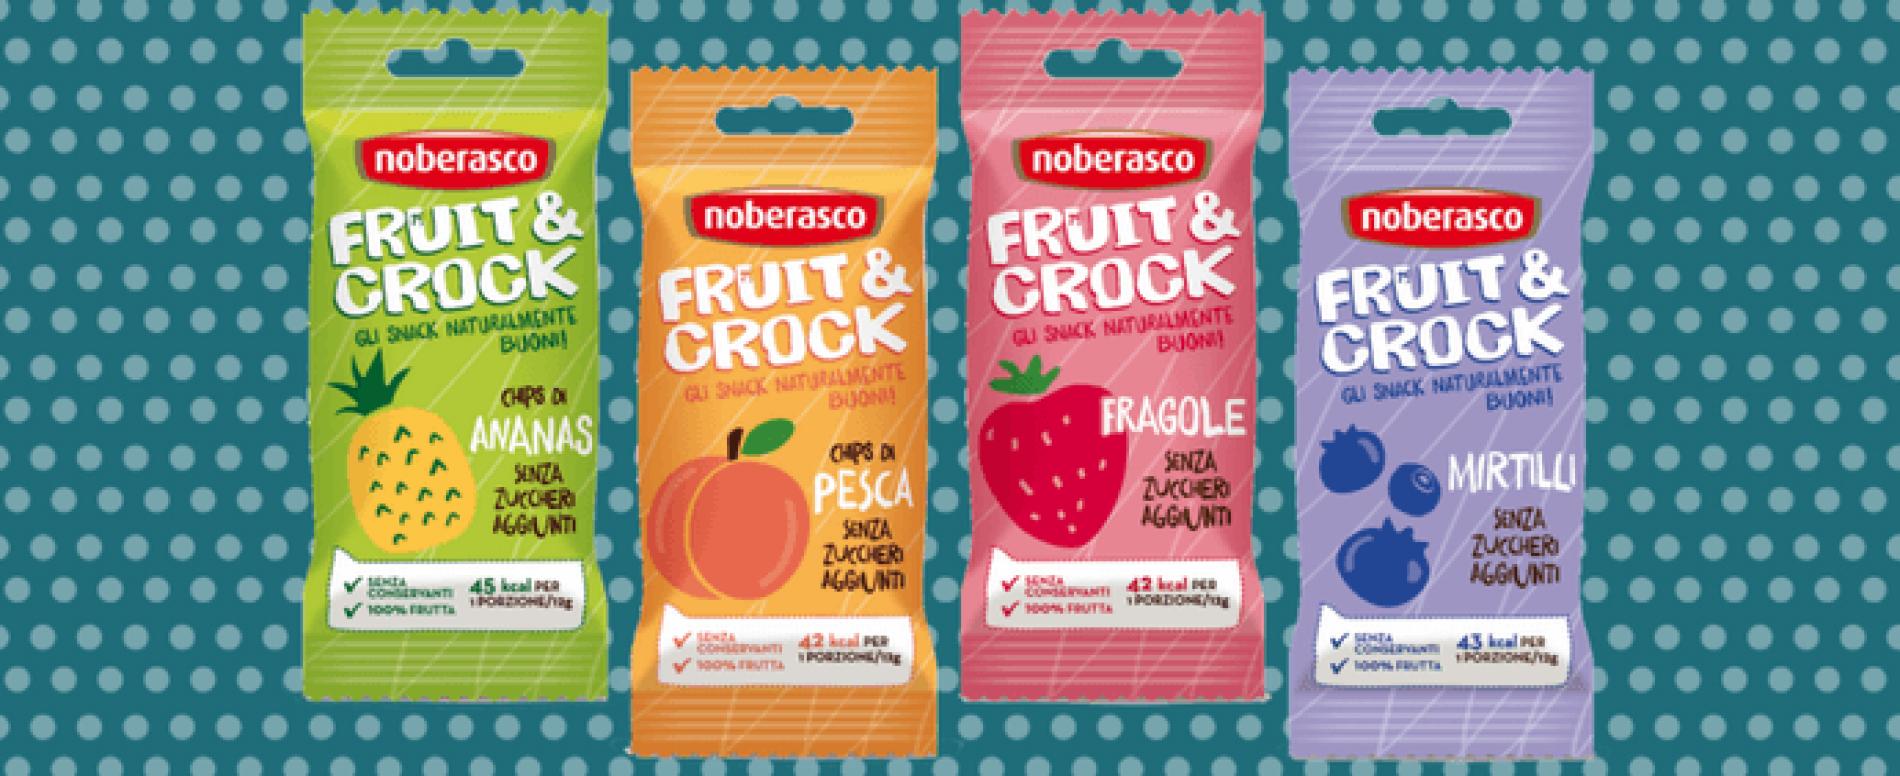 Fruit & Crock, uno snack croccante e 100% naturale di Noberasco